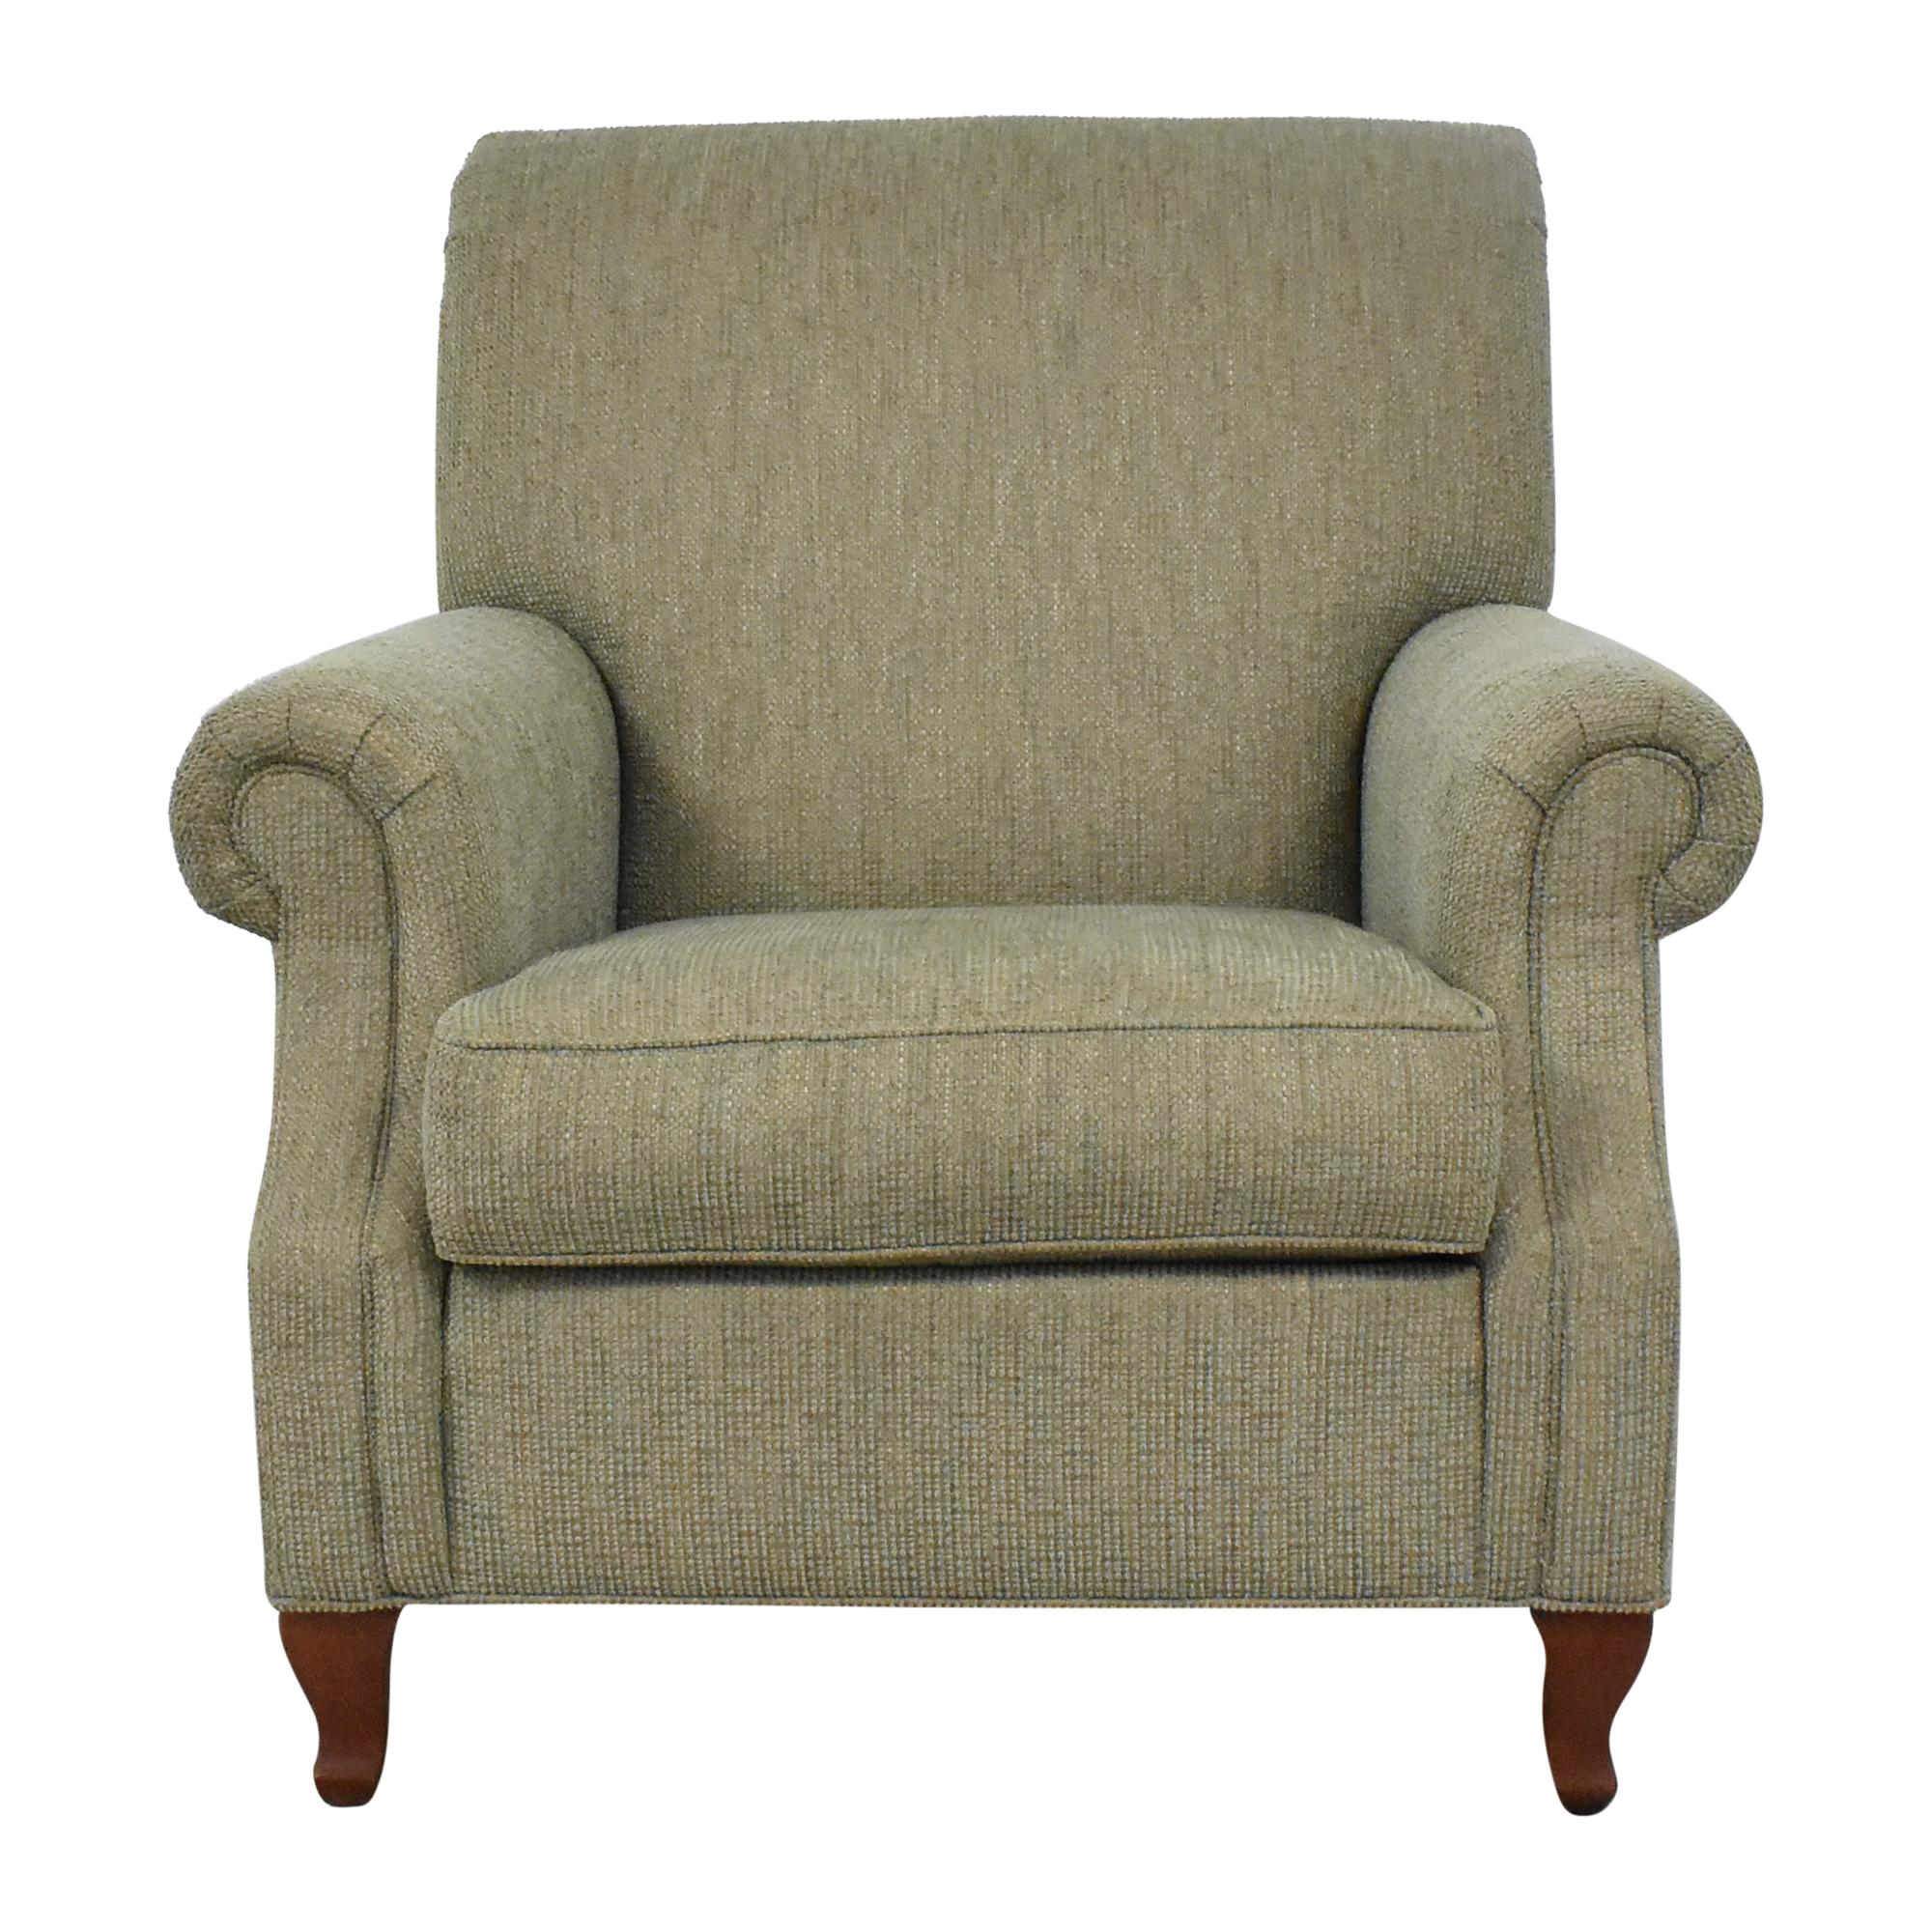 buy Ethan Allen  Ethan Allen Avery Chair online